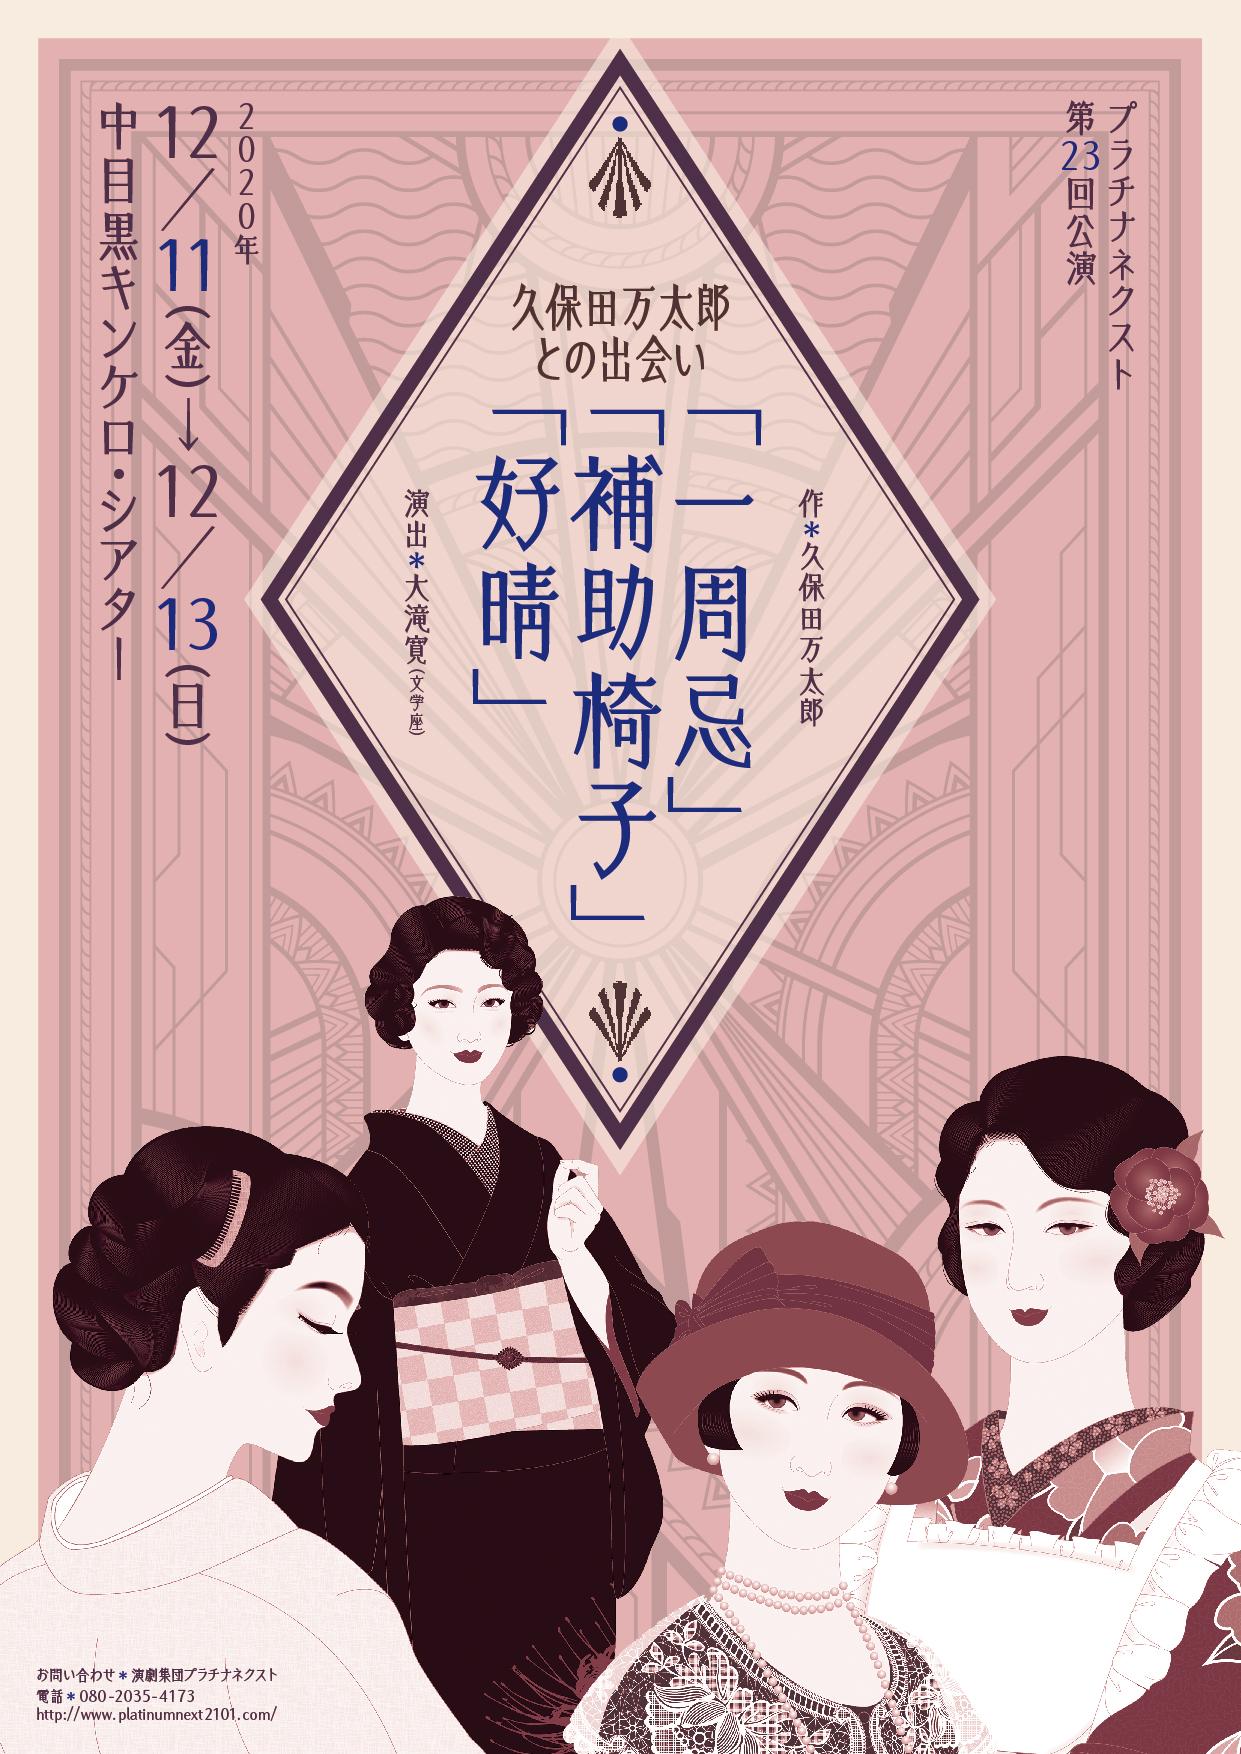 第二十三回公演 久保田万太郎との出会い